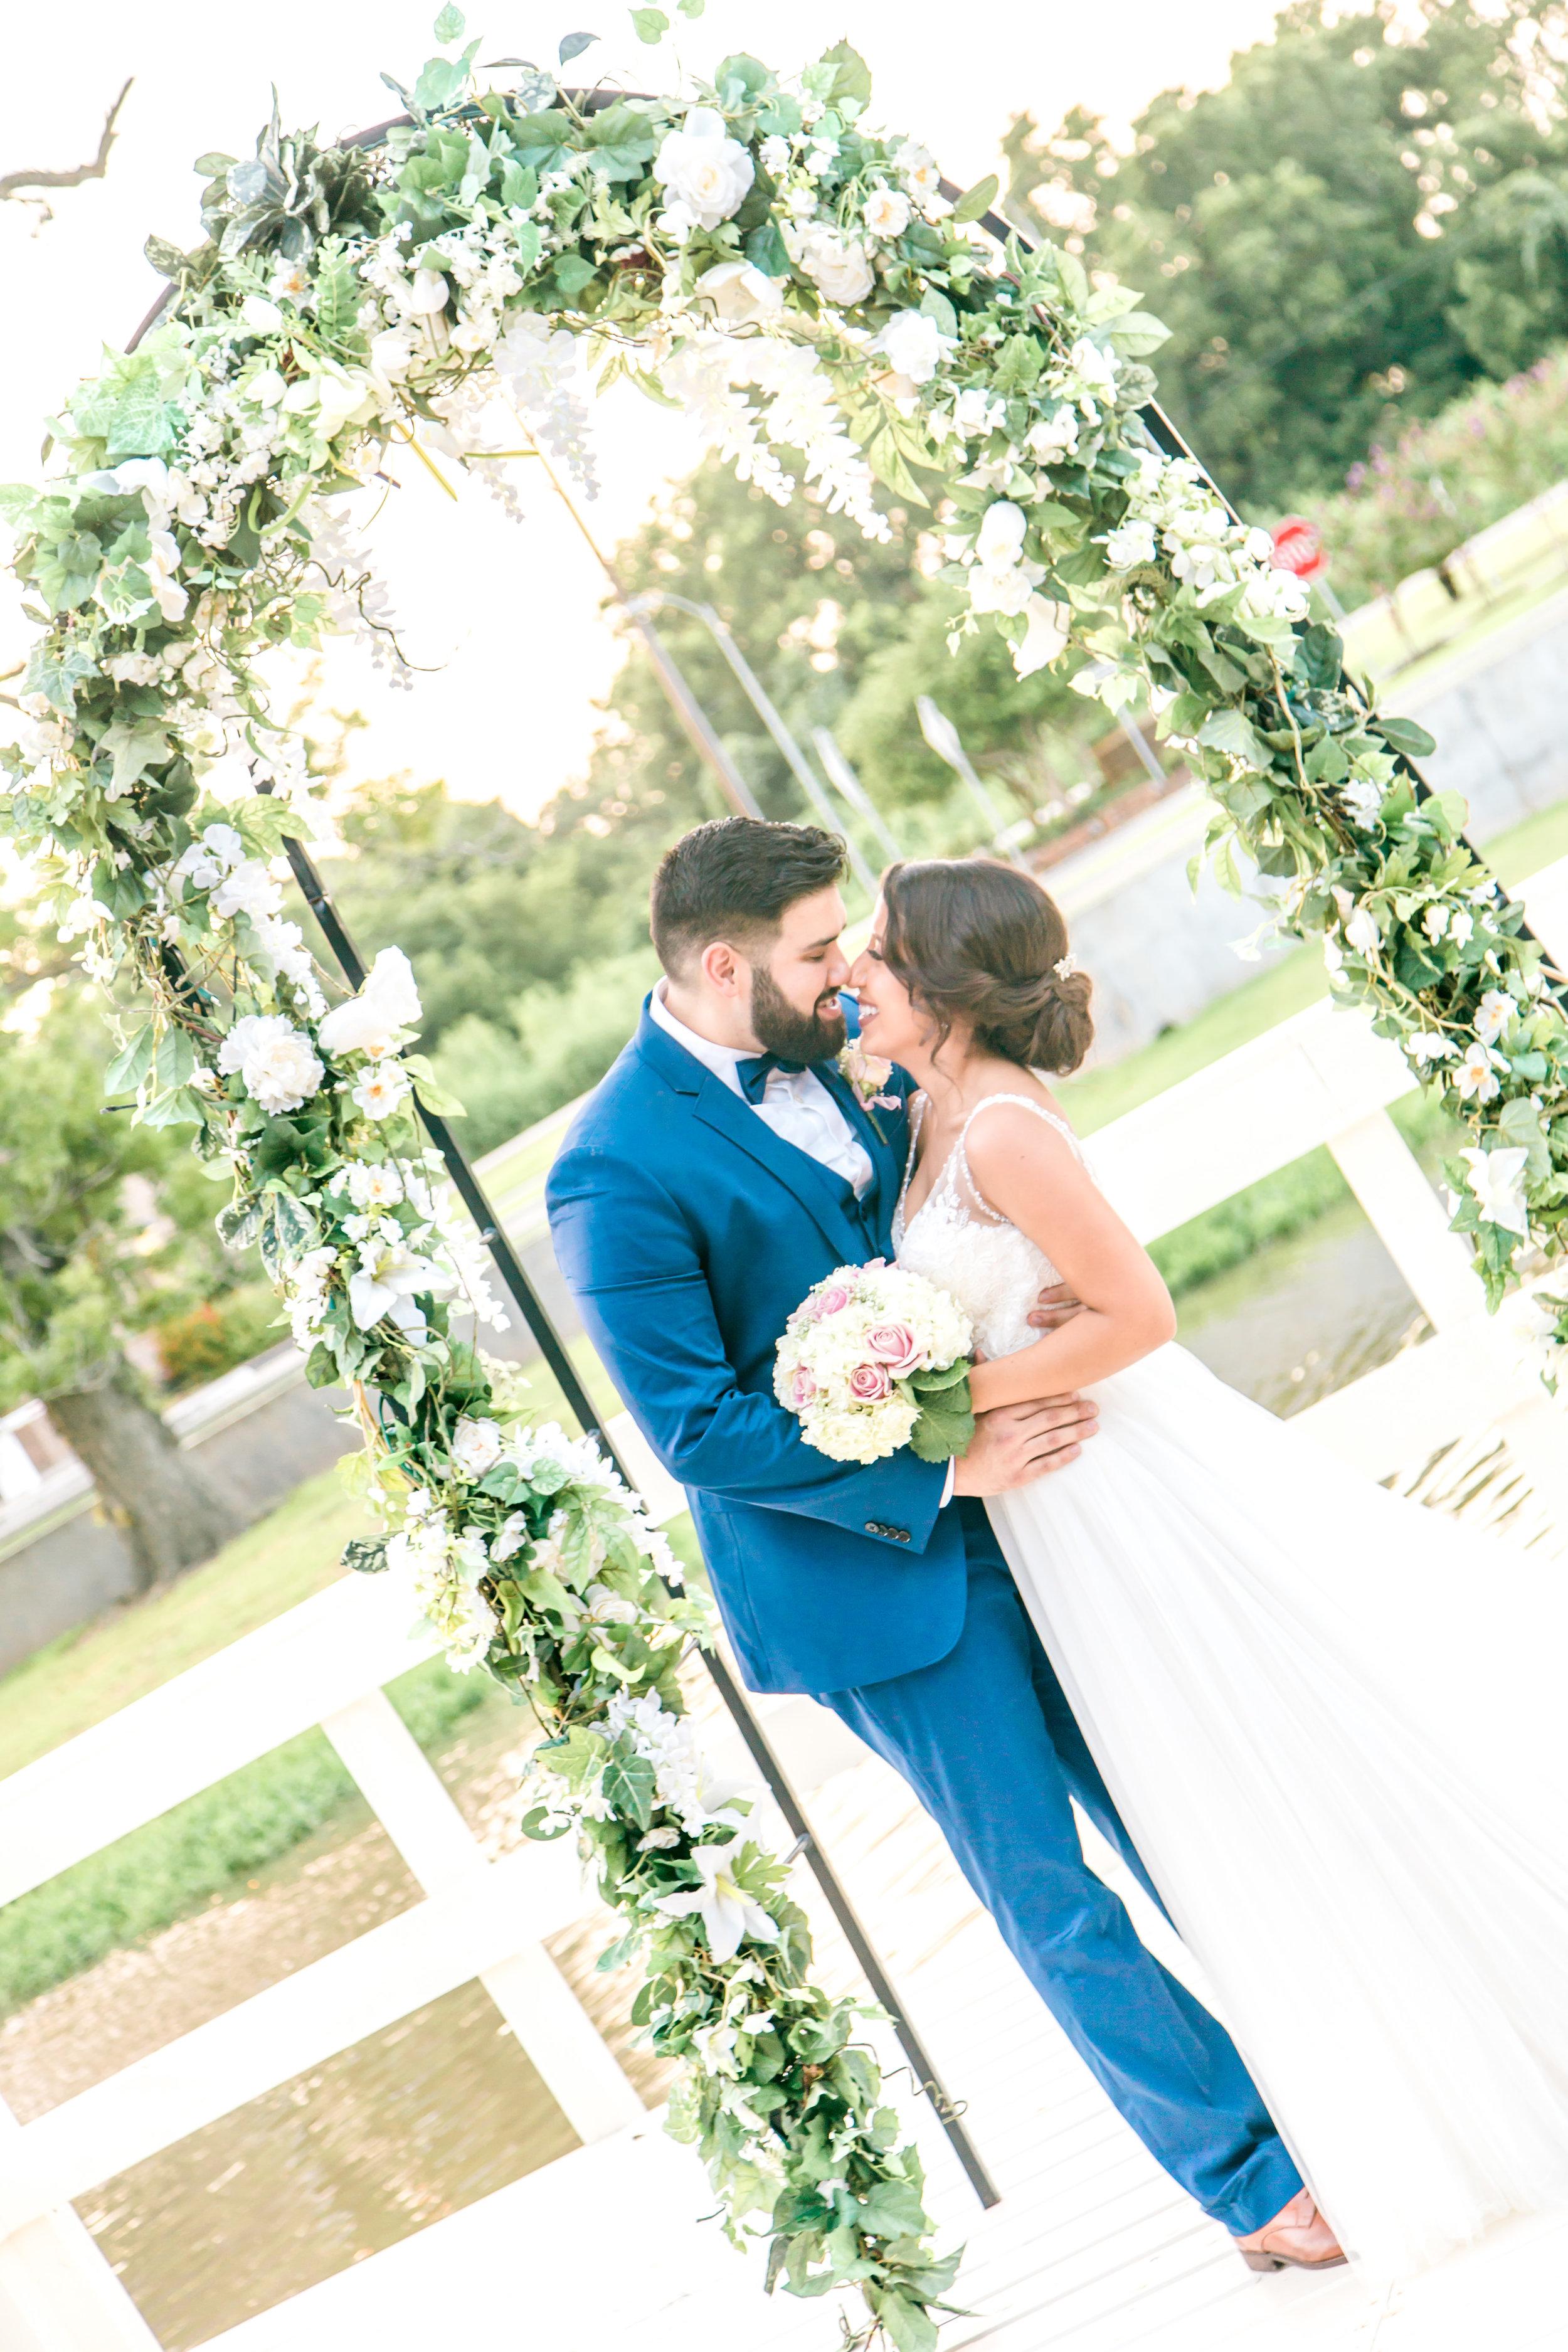 20170805-Wedding-Caro-and-Sergio-464.jpg